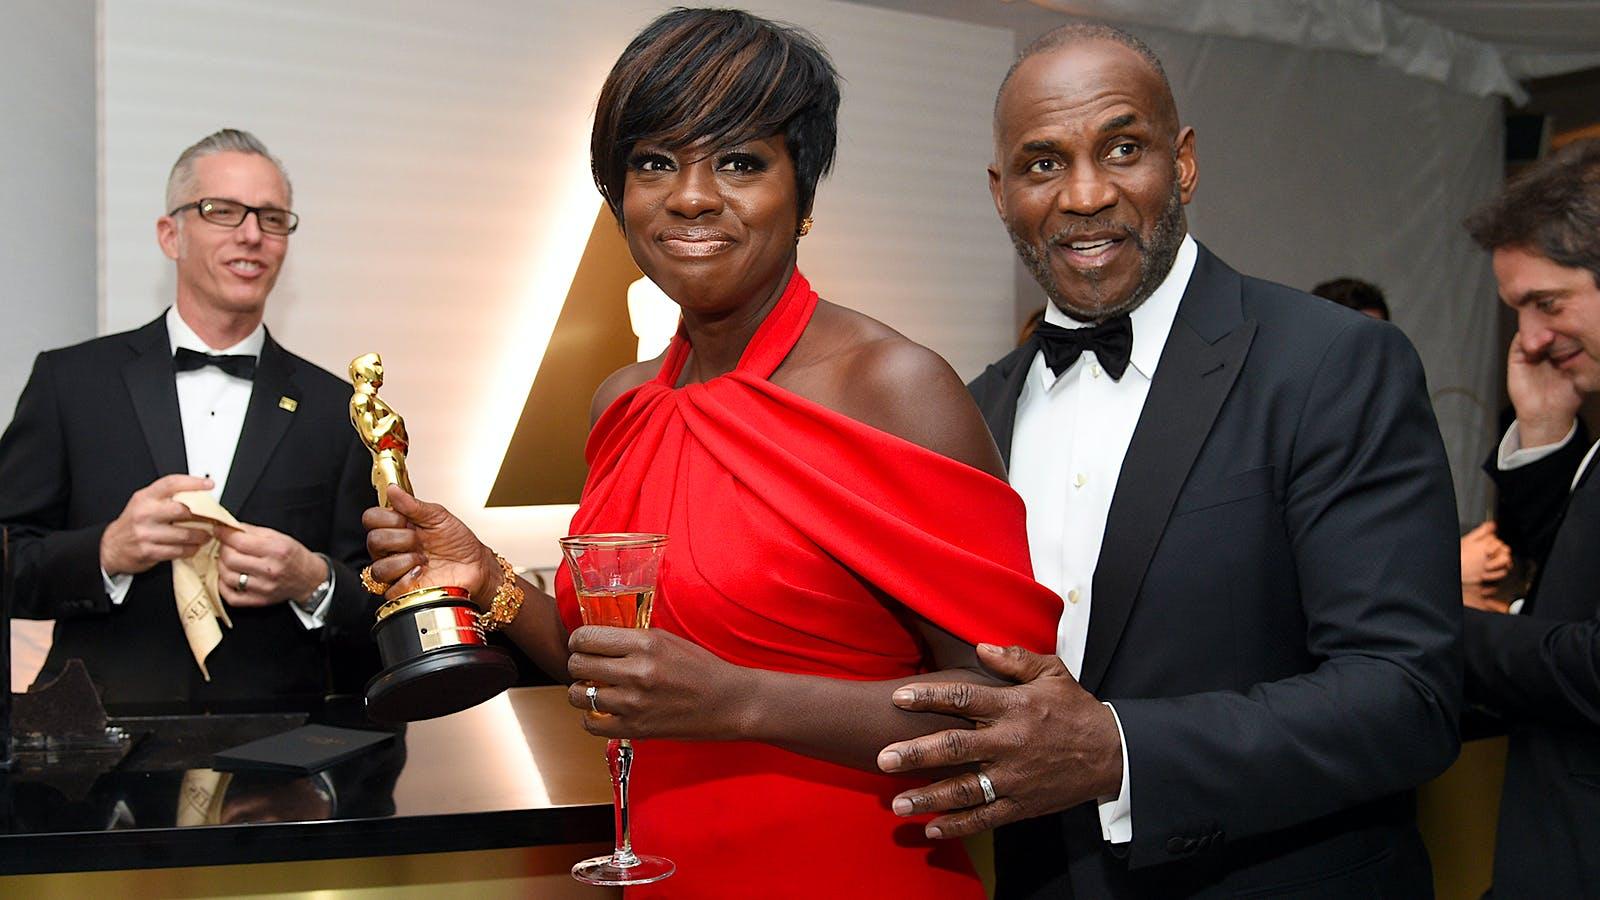 Awards Season Ends with Big Bubblies, Bigger Surprises